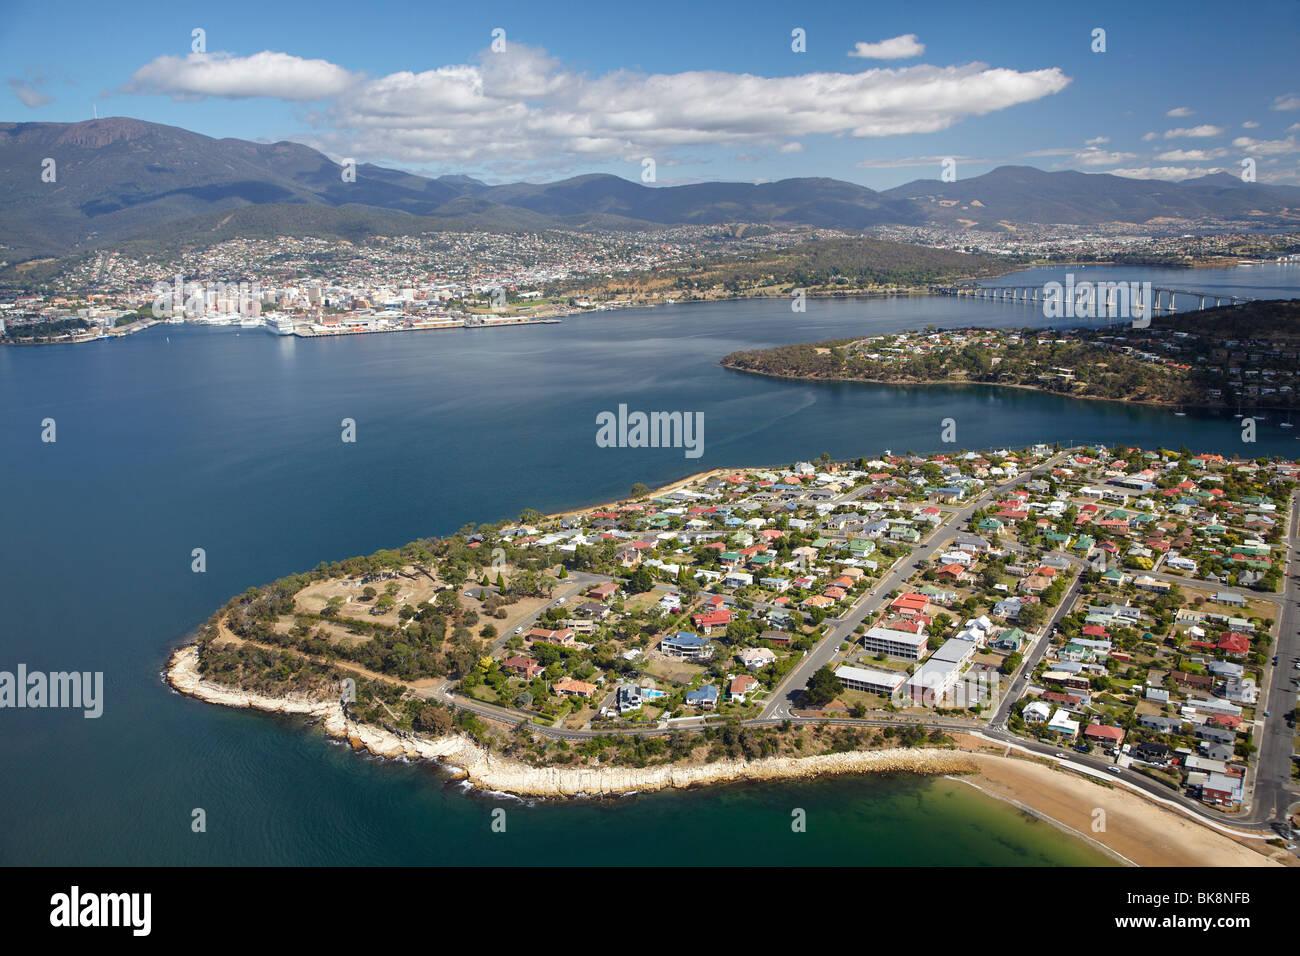 Kangaroo Bluff Historic Site, Bellerive, River Derwent, Hobart, and Mt Wellington, Tasmania, Australia - aerial - Stock Image